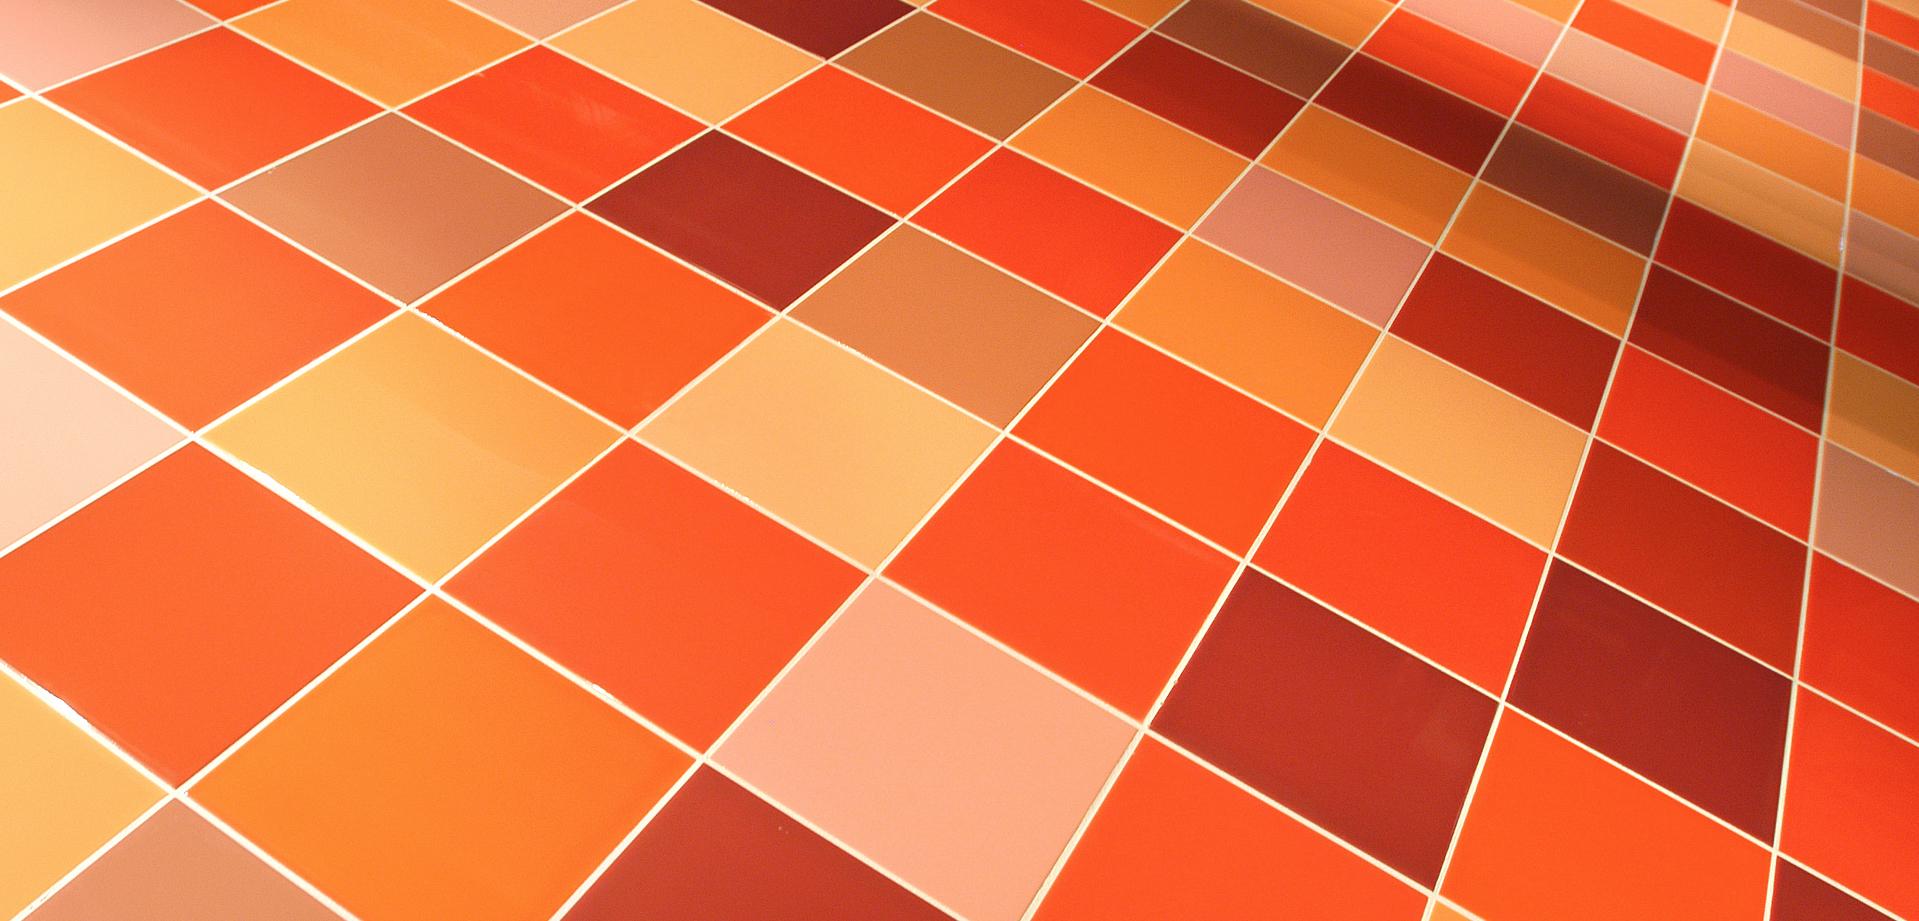 mosa-colors1.jpg